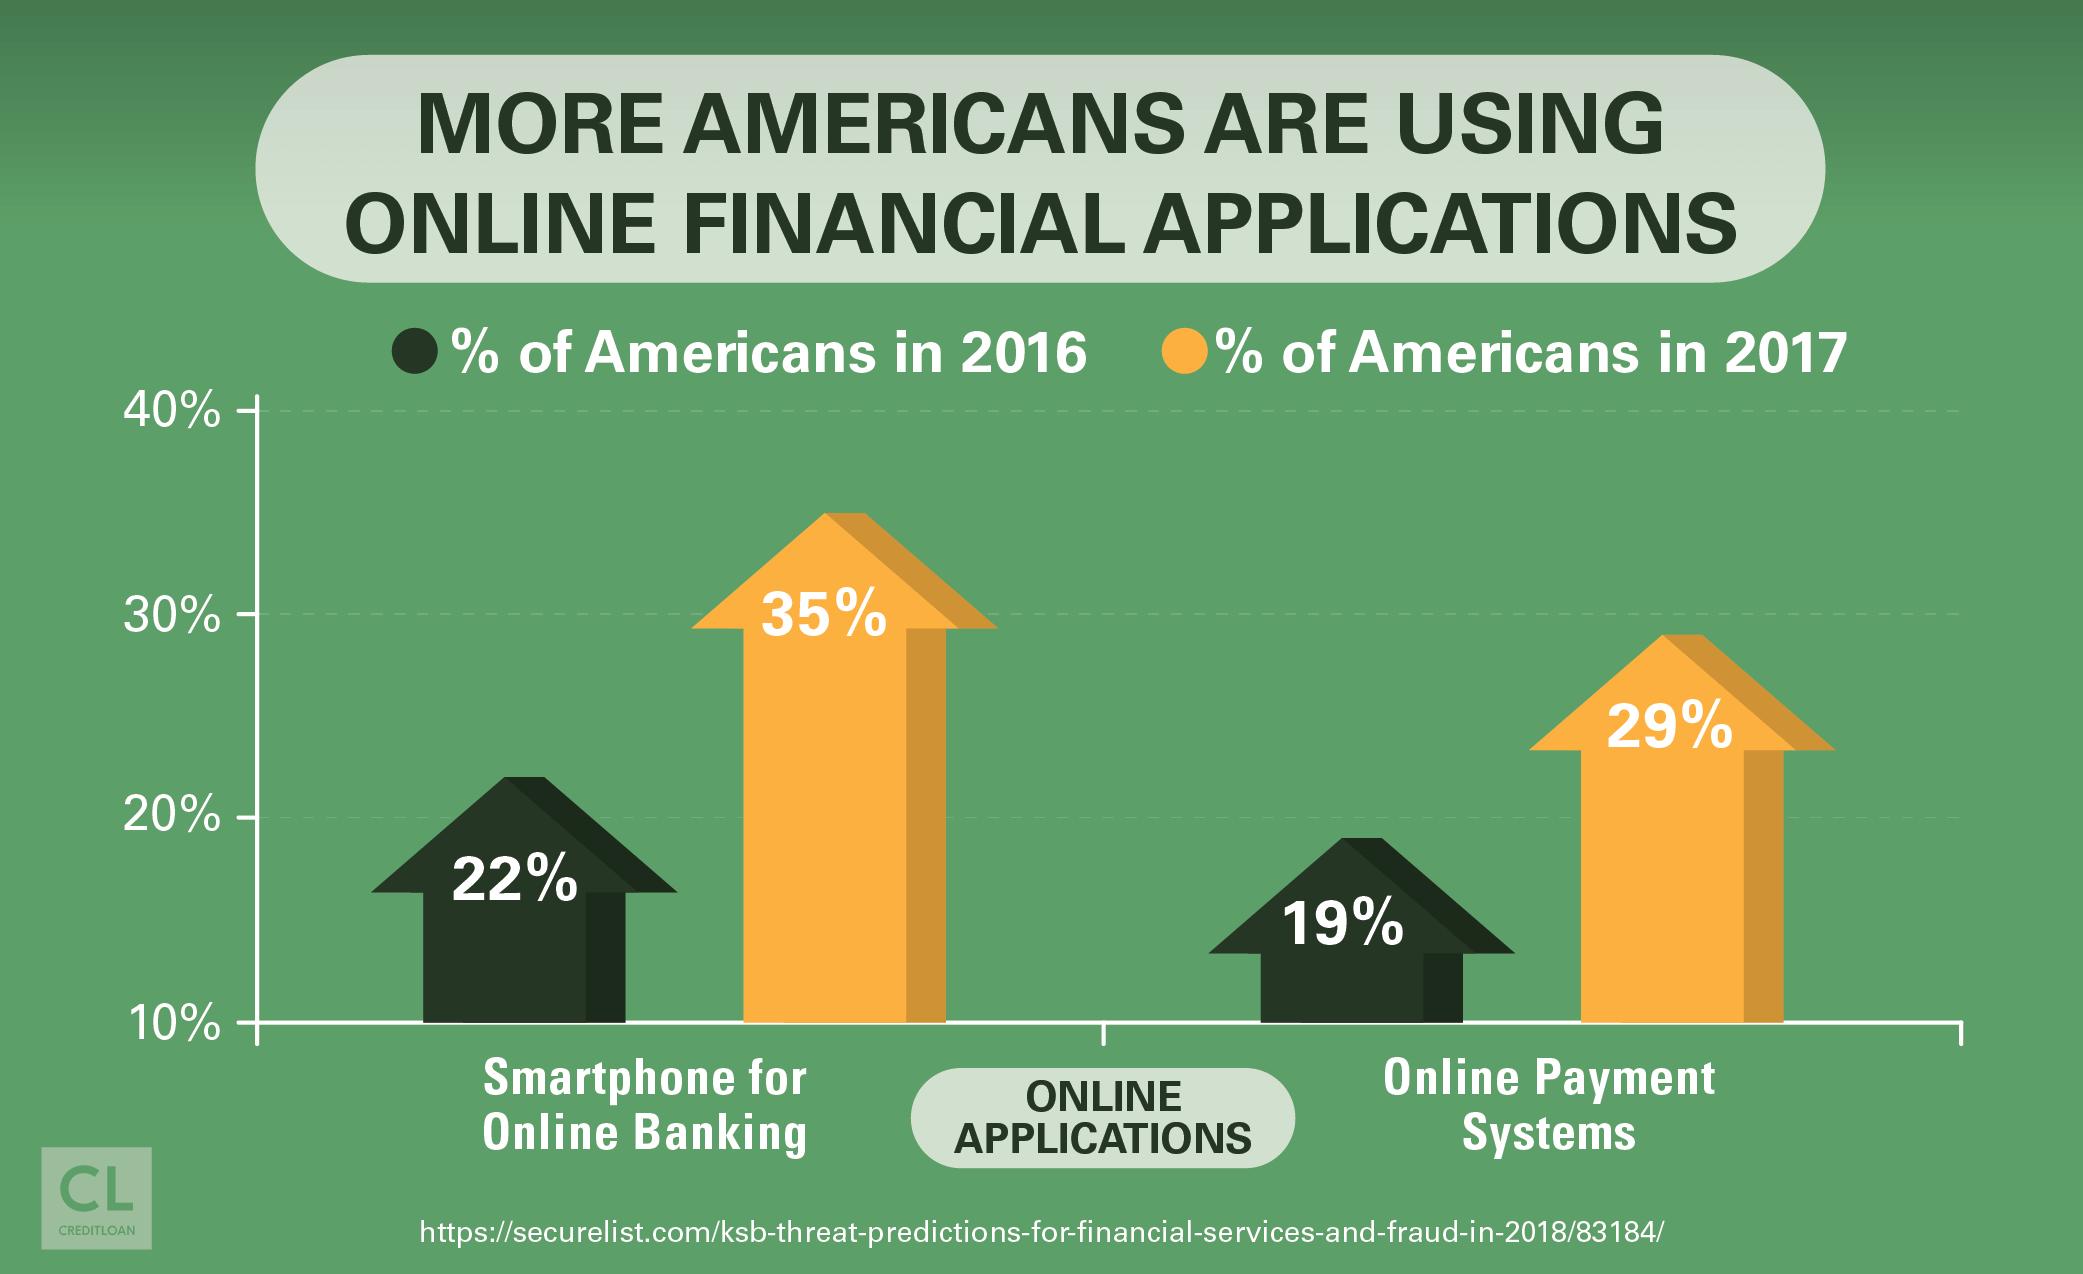 Online Financial Application Usage 2016-2017